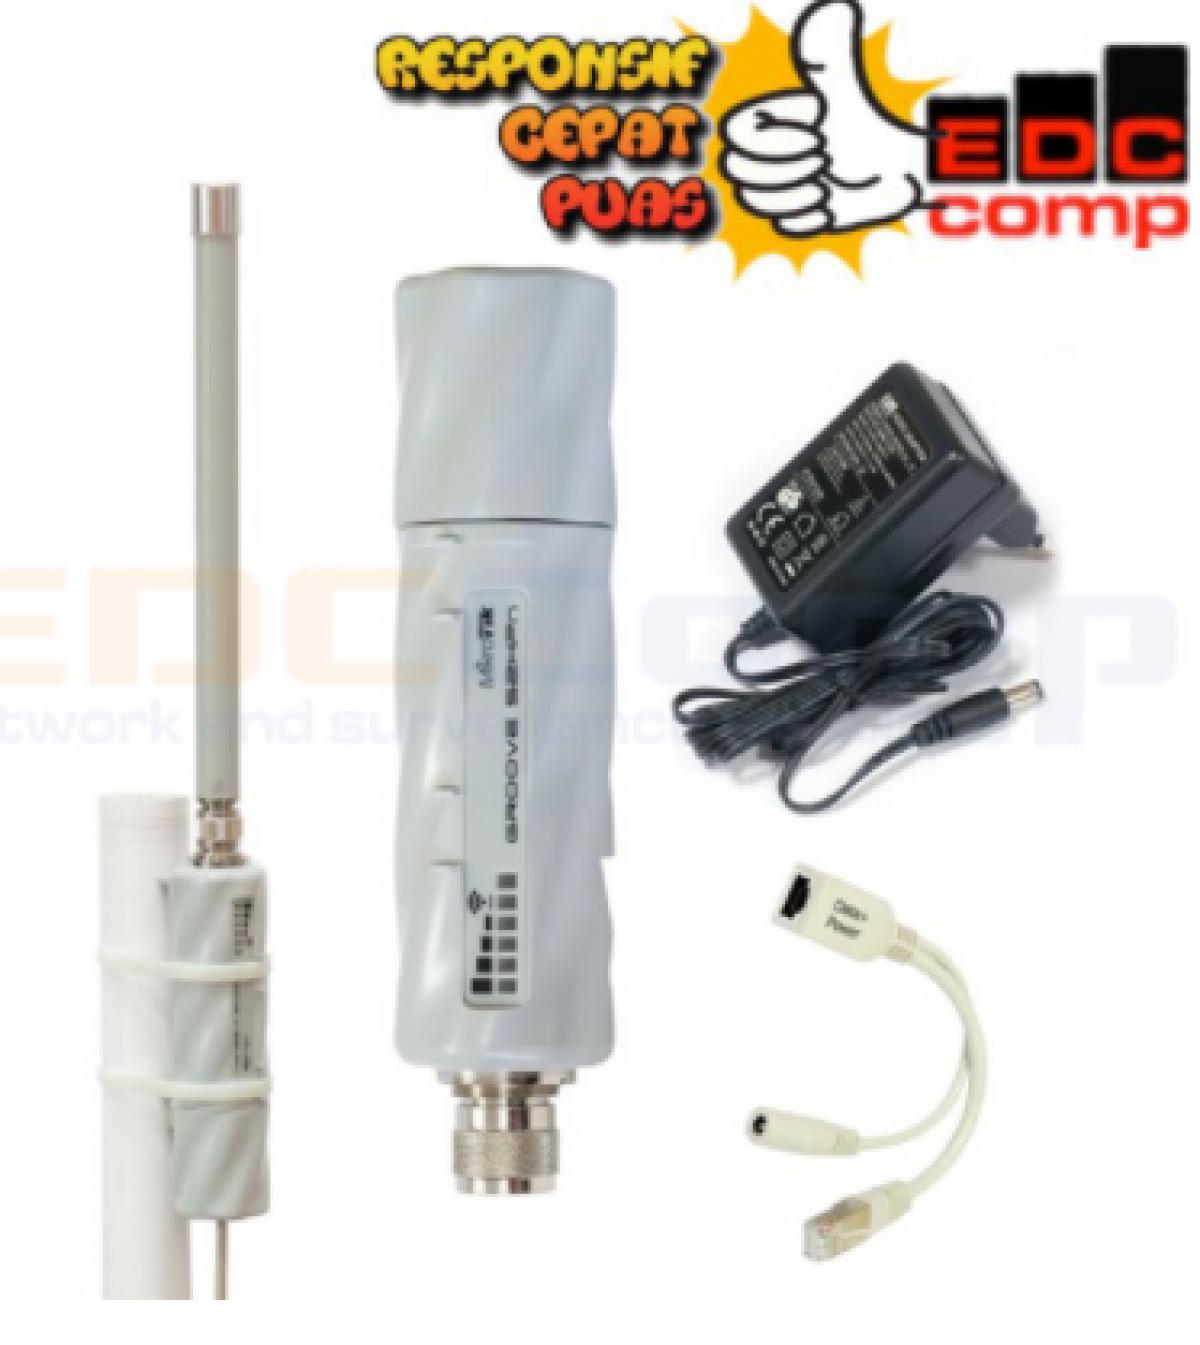 Paket Wifi Hotspot Mikrotik Groove A 52HPn dan Omni Dual Band 12 - EdcComp